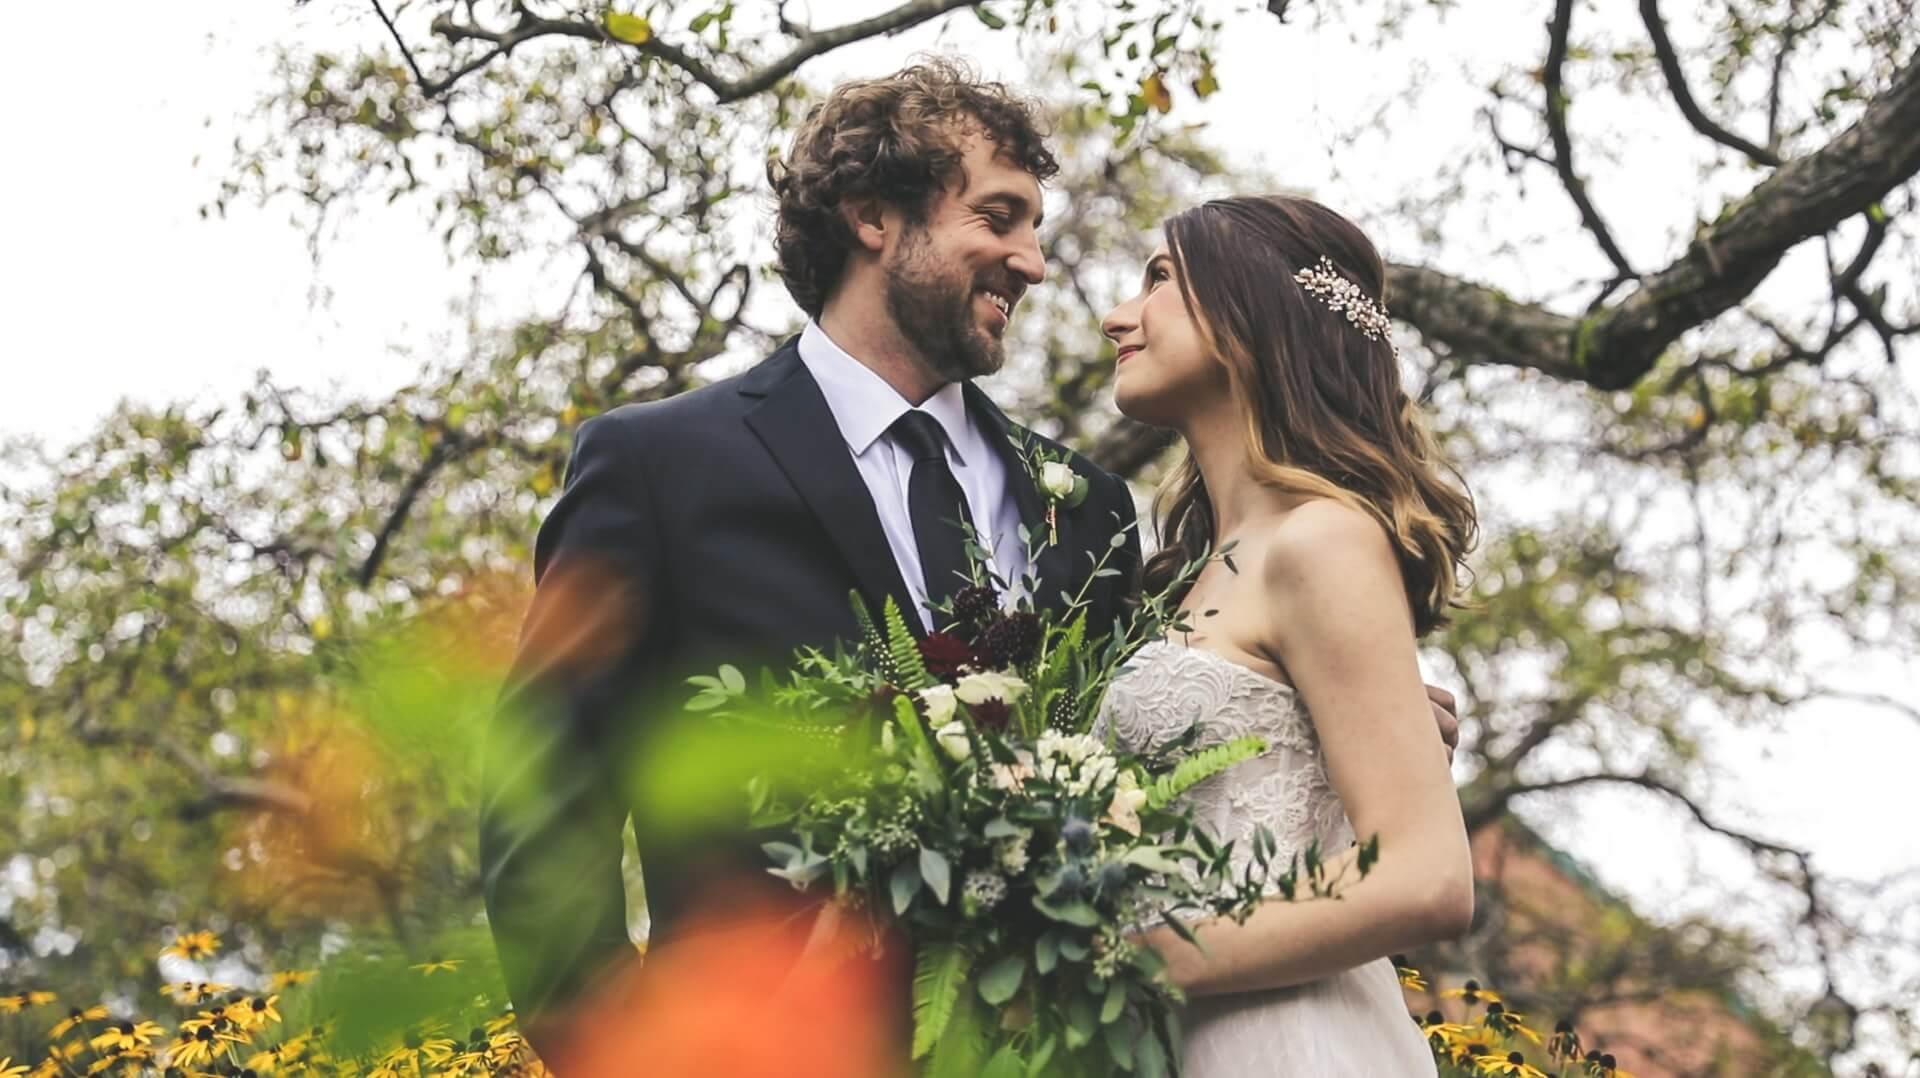 Bröllop på Ekebyhovs Slott